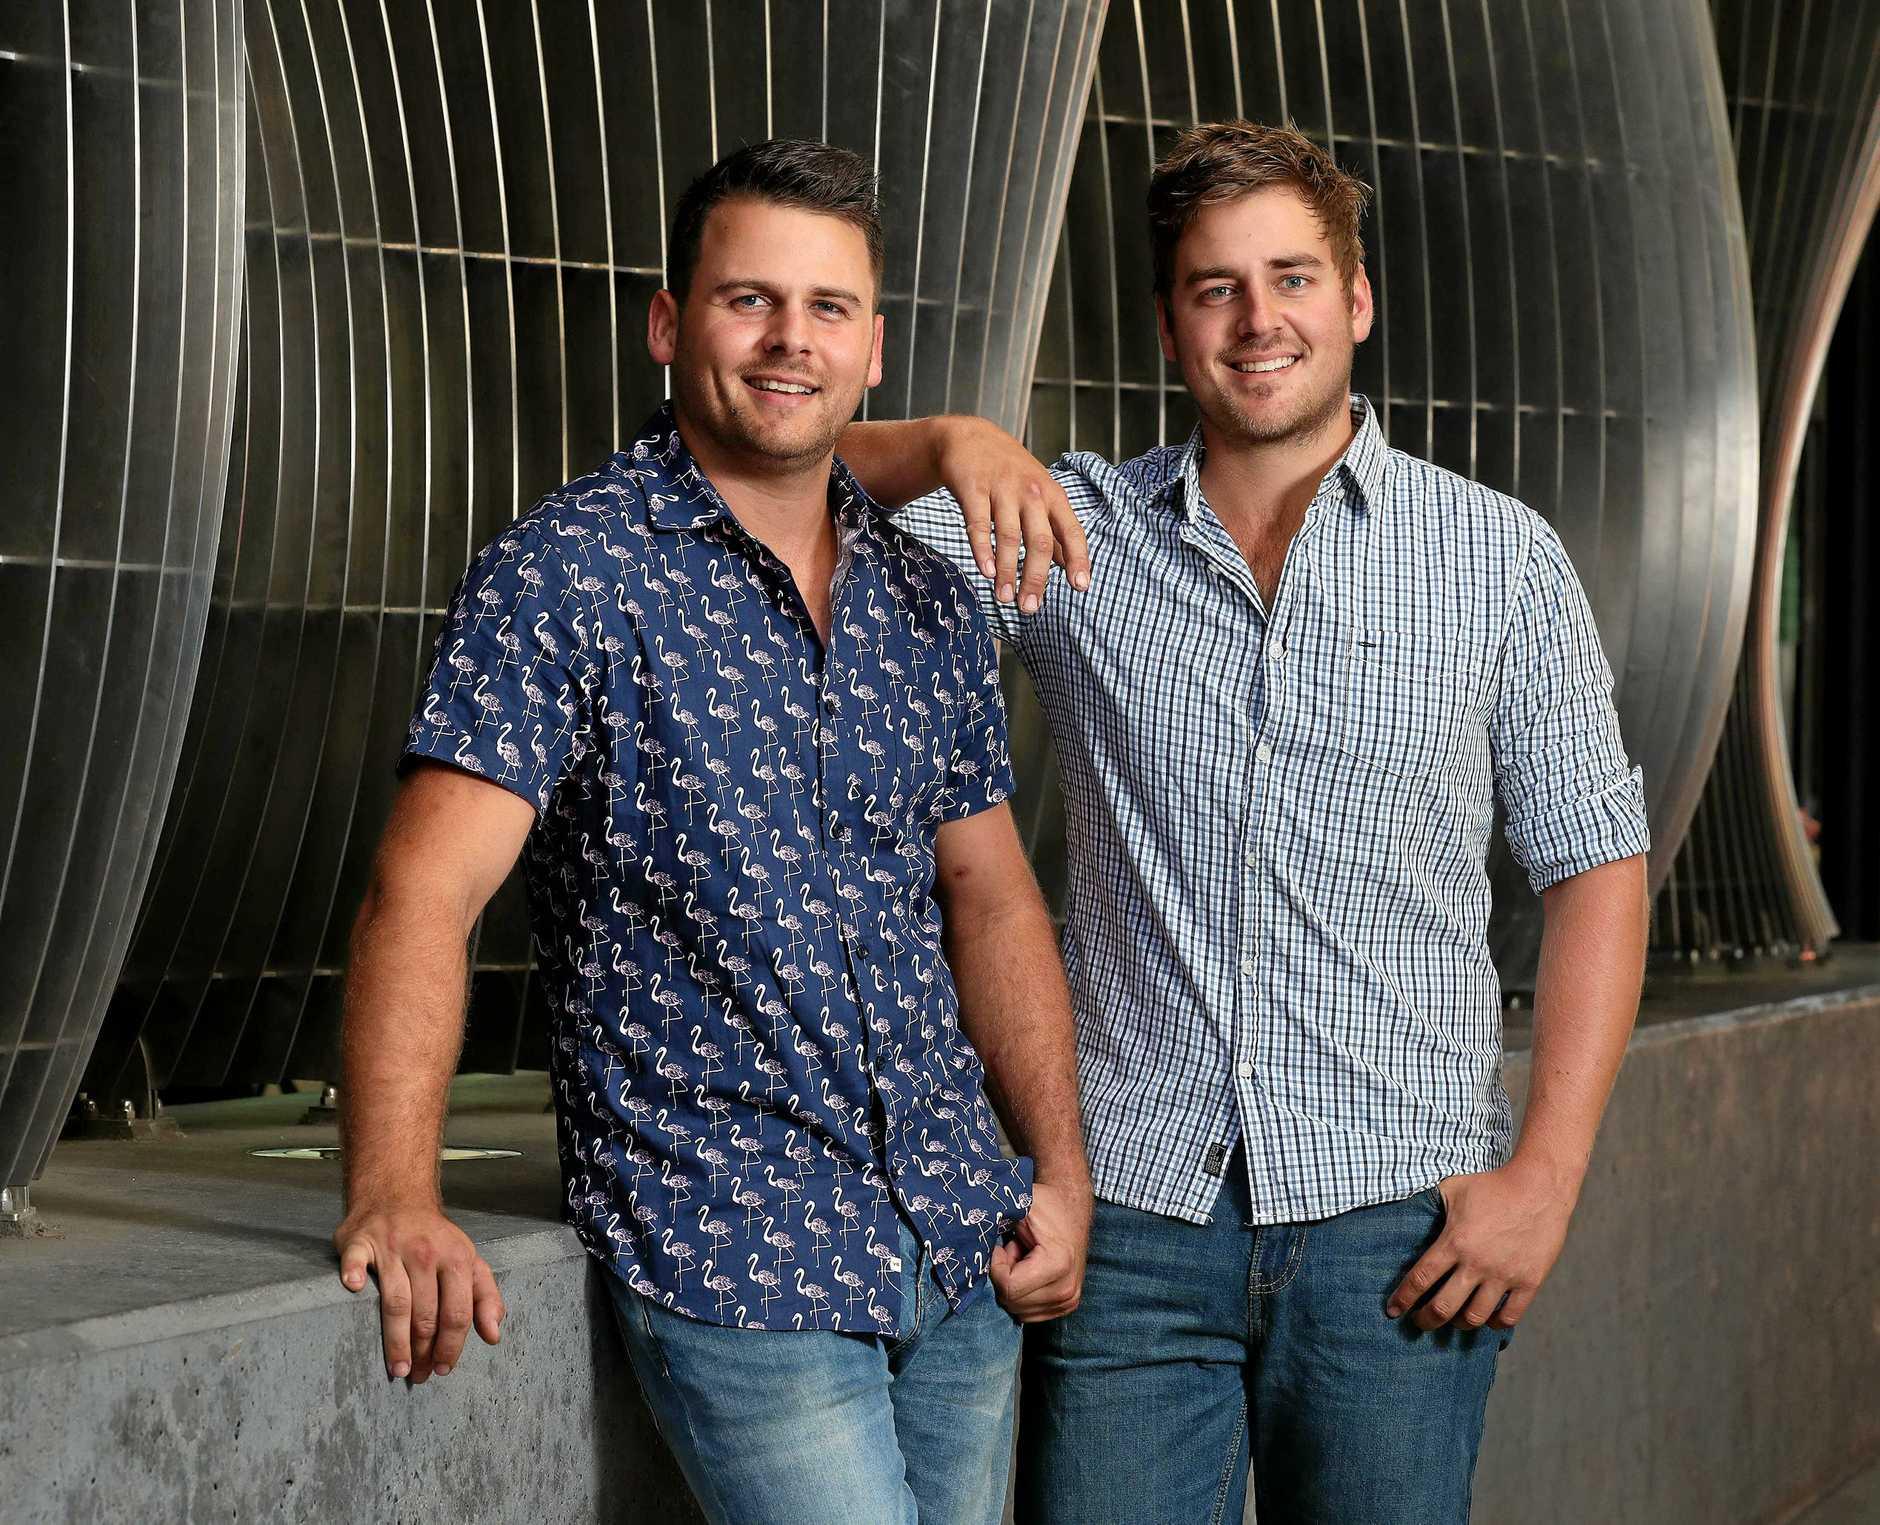 House Rules contestants Josh and Brandon Jarius. Photographer: Liam Kidston.